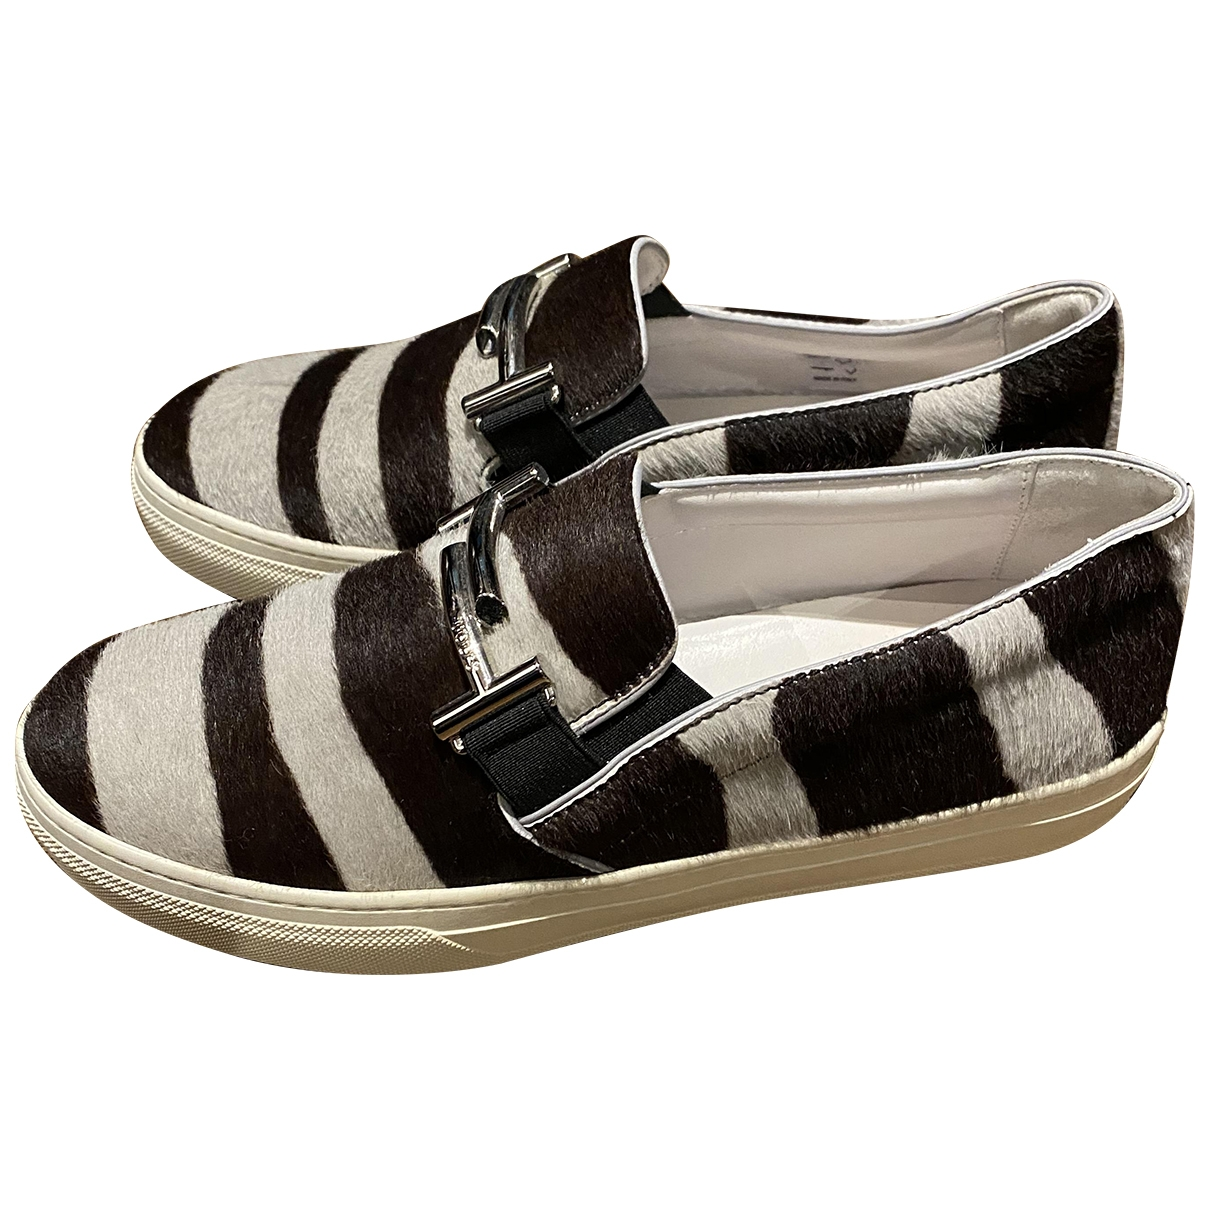 Tod's \N Pony-style calfskin Flats for Women 37 EU